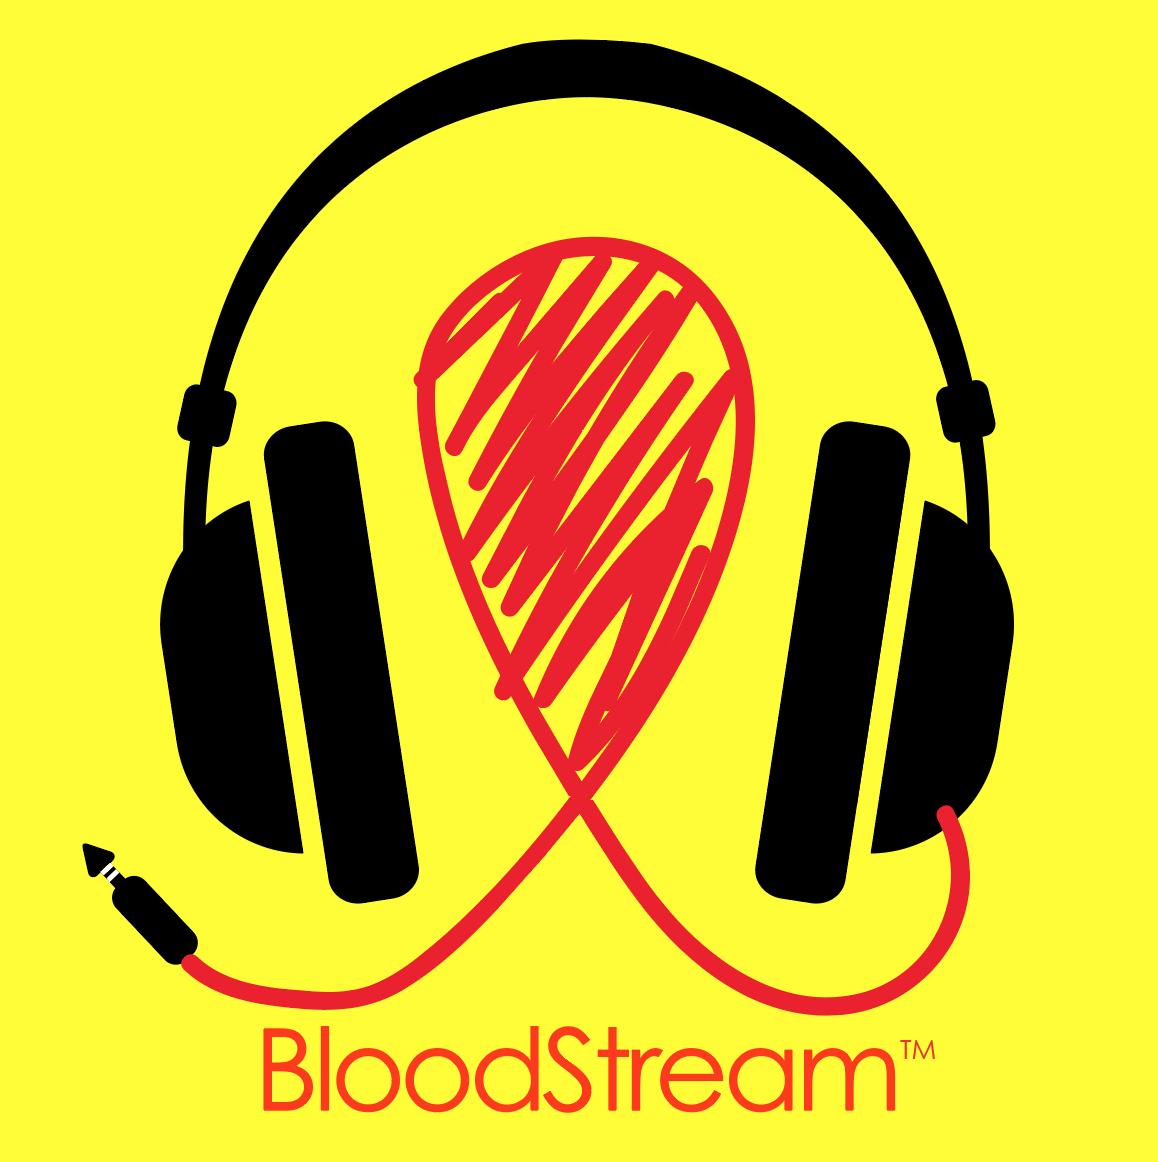 bloodstream logo.png